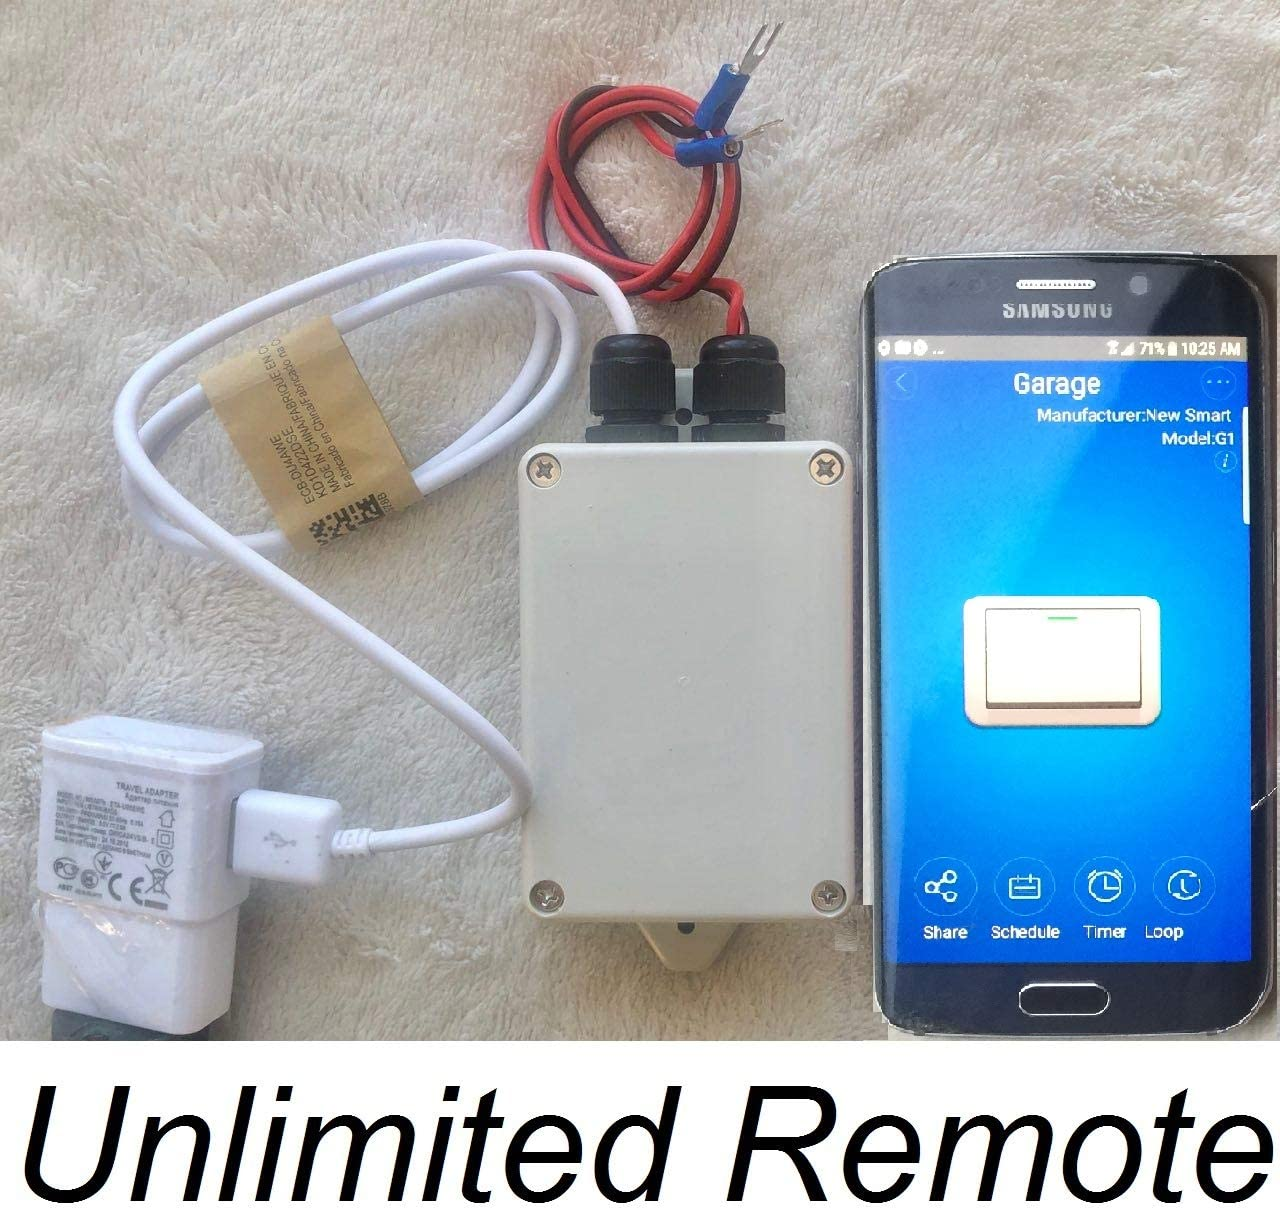 Wireless Garage Door Opener Remote WiFi Switch Open Gate Control By Smartphone